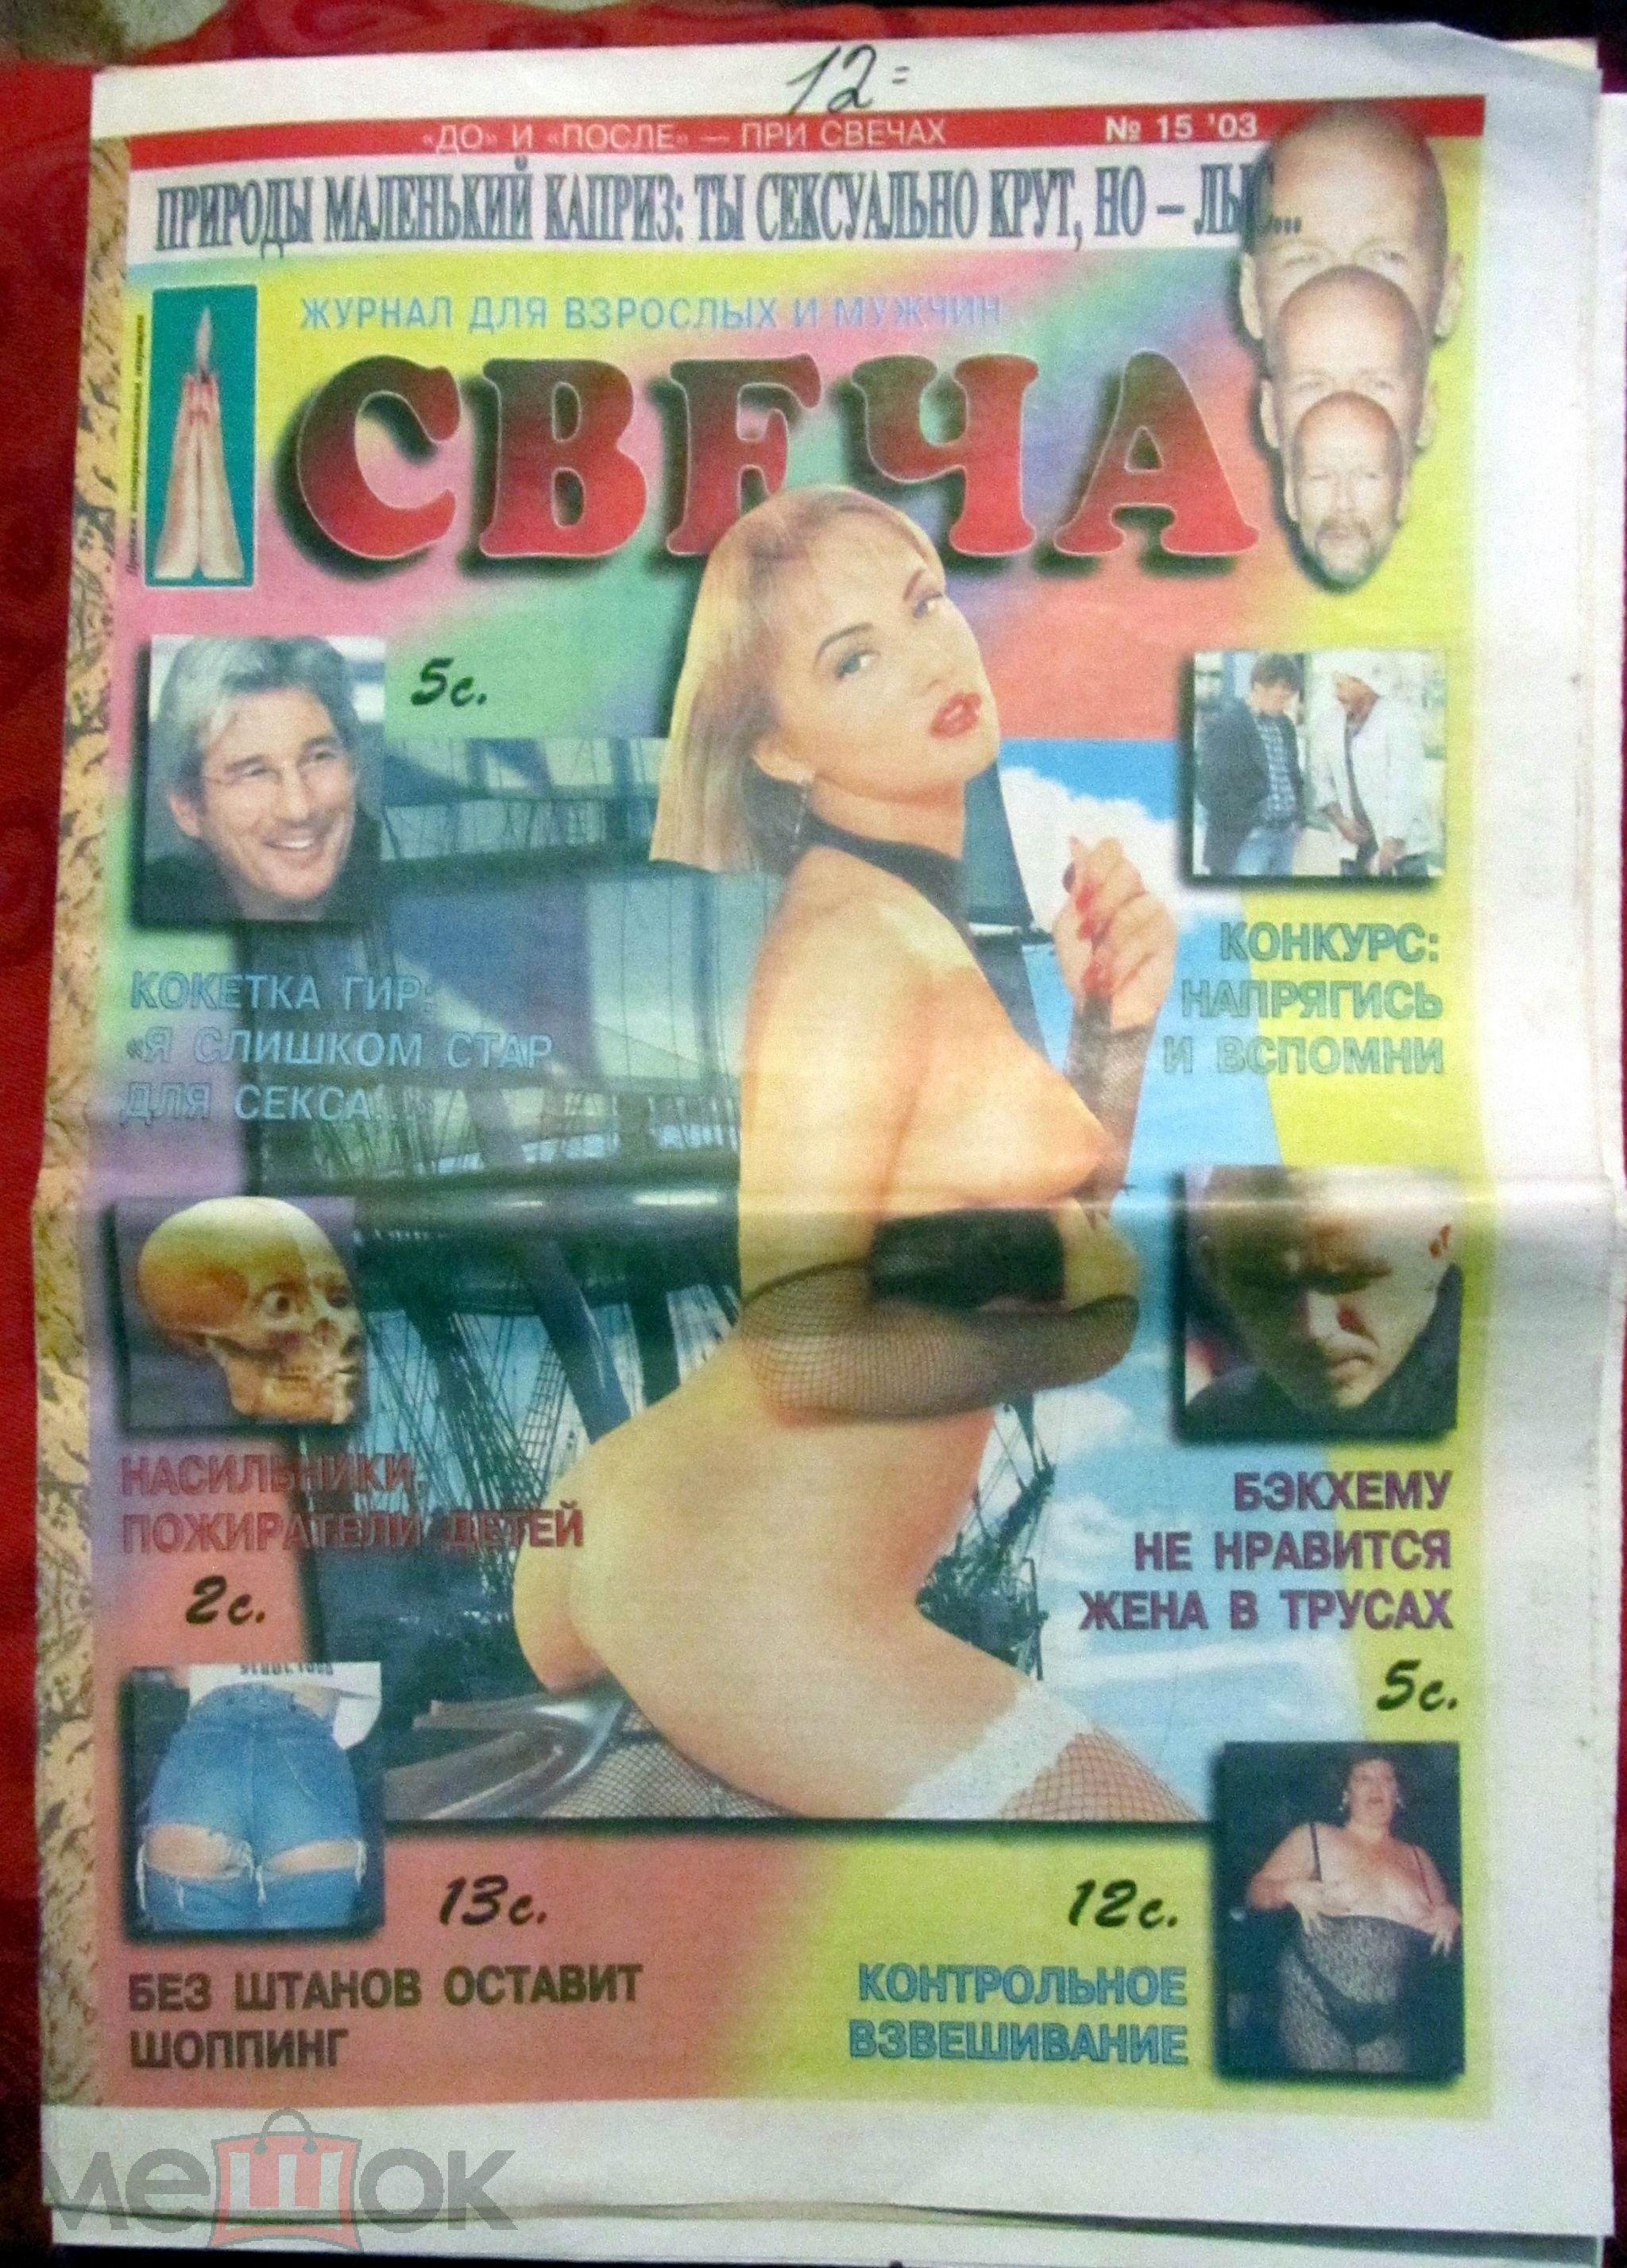 Подписка на порно журнал